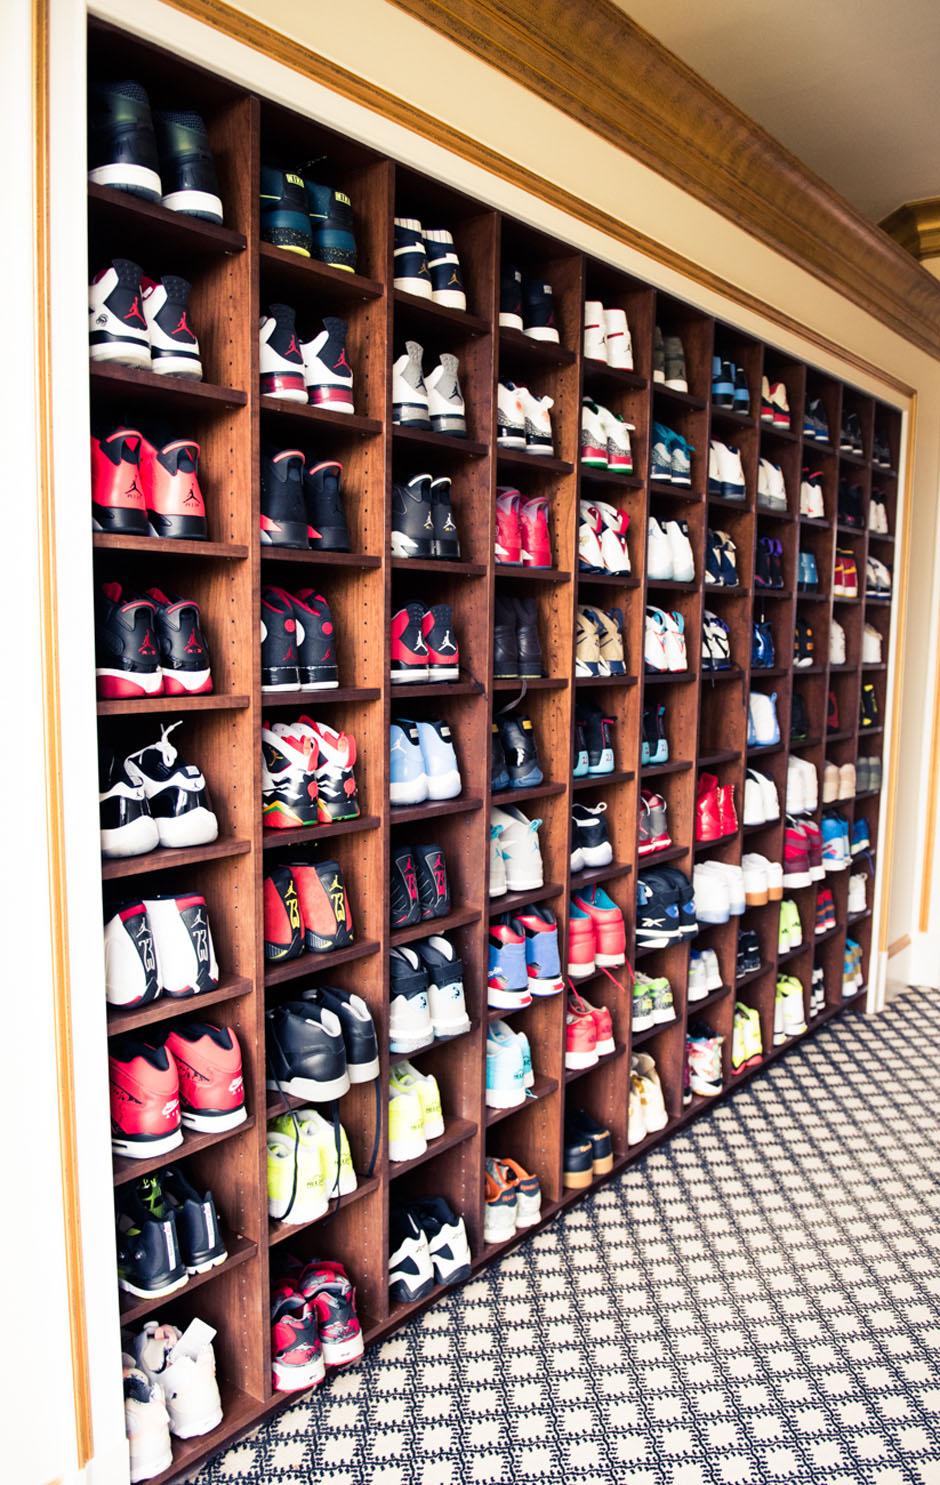 Closet Collection: Rick Ross Displays His Sneaker Closet Like A Museum